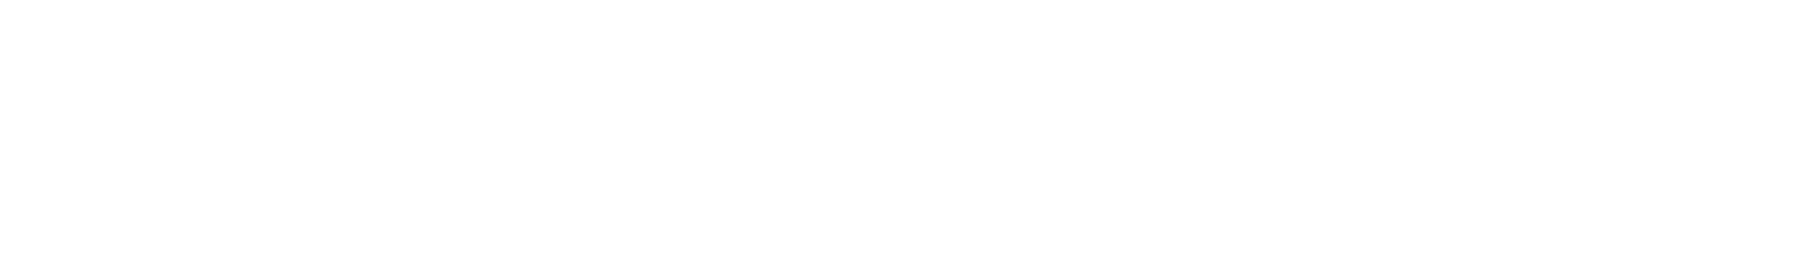 rap melody | Sample Focus